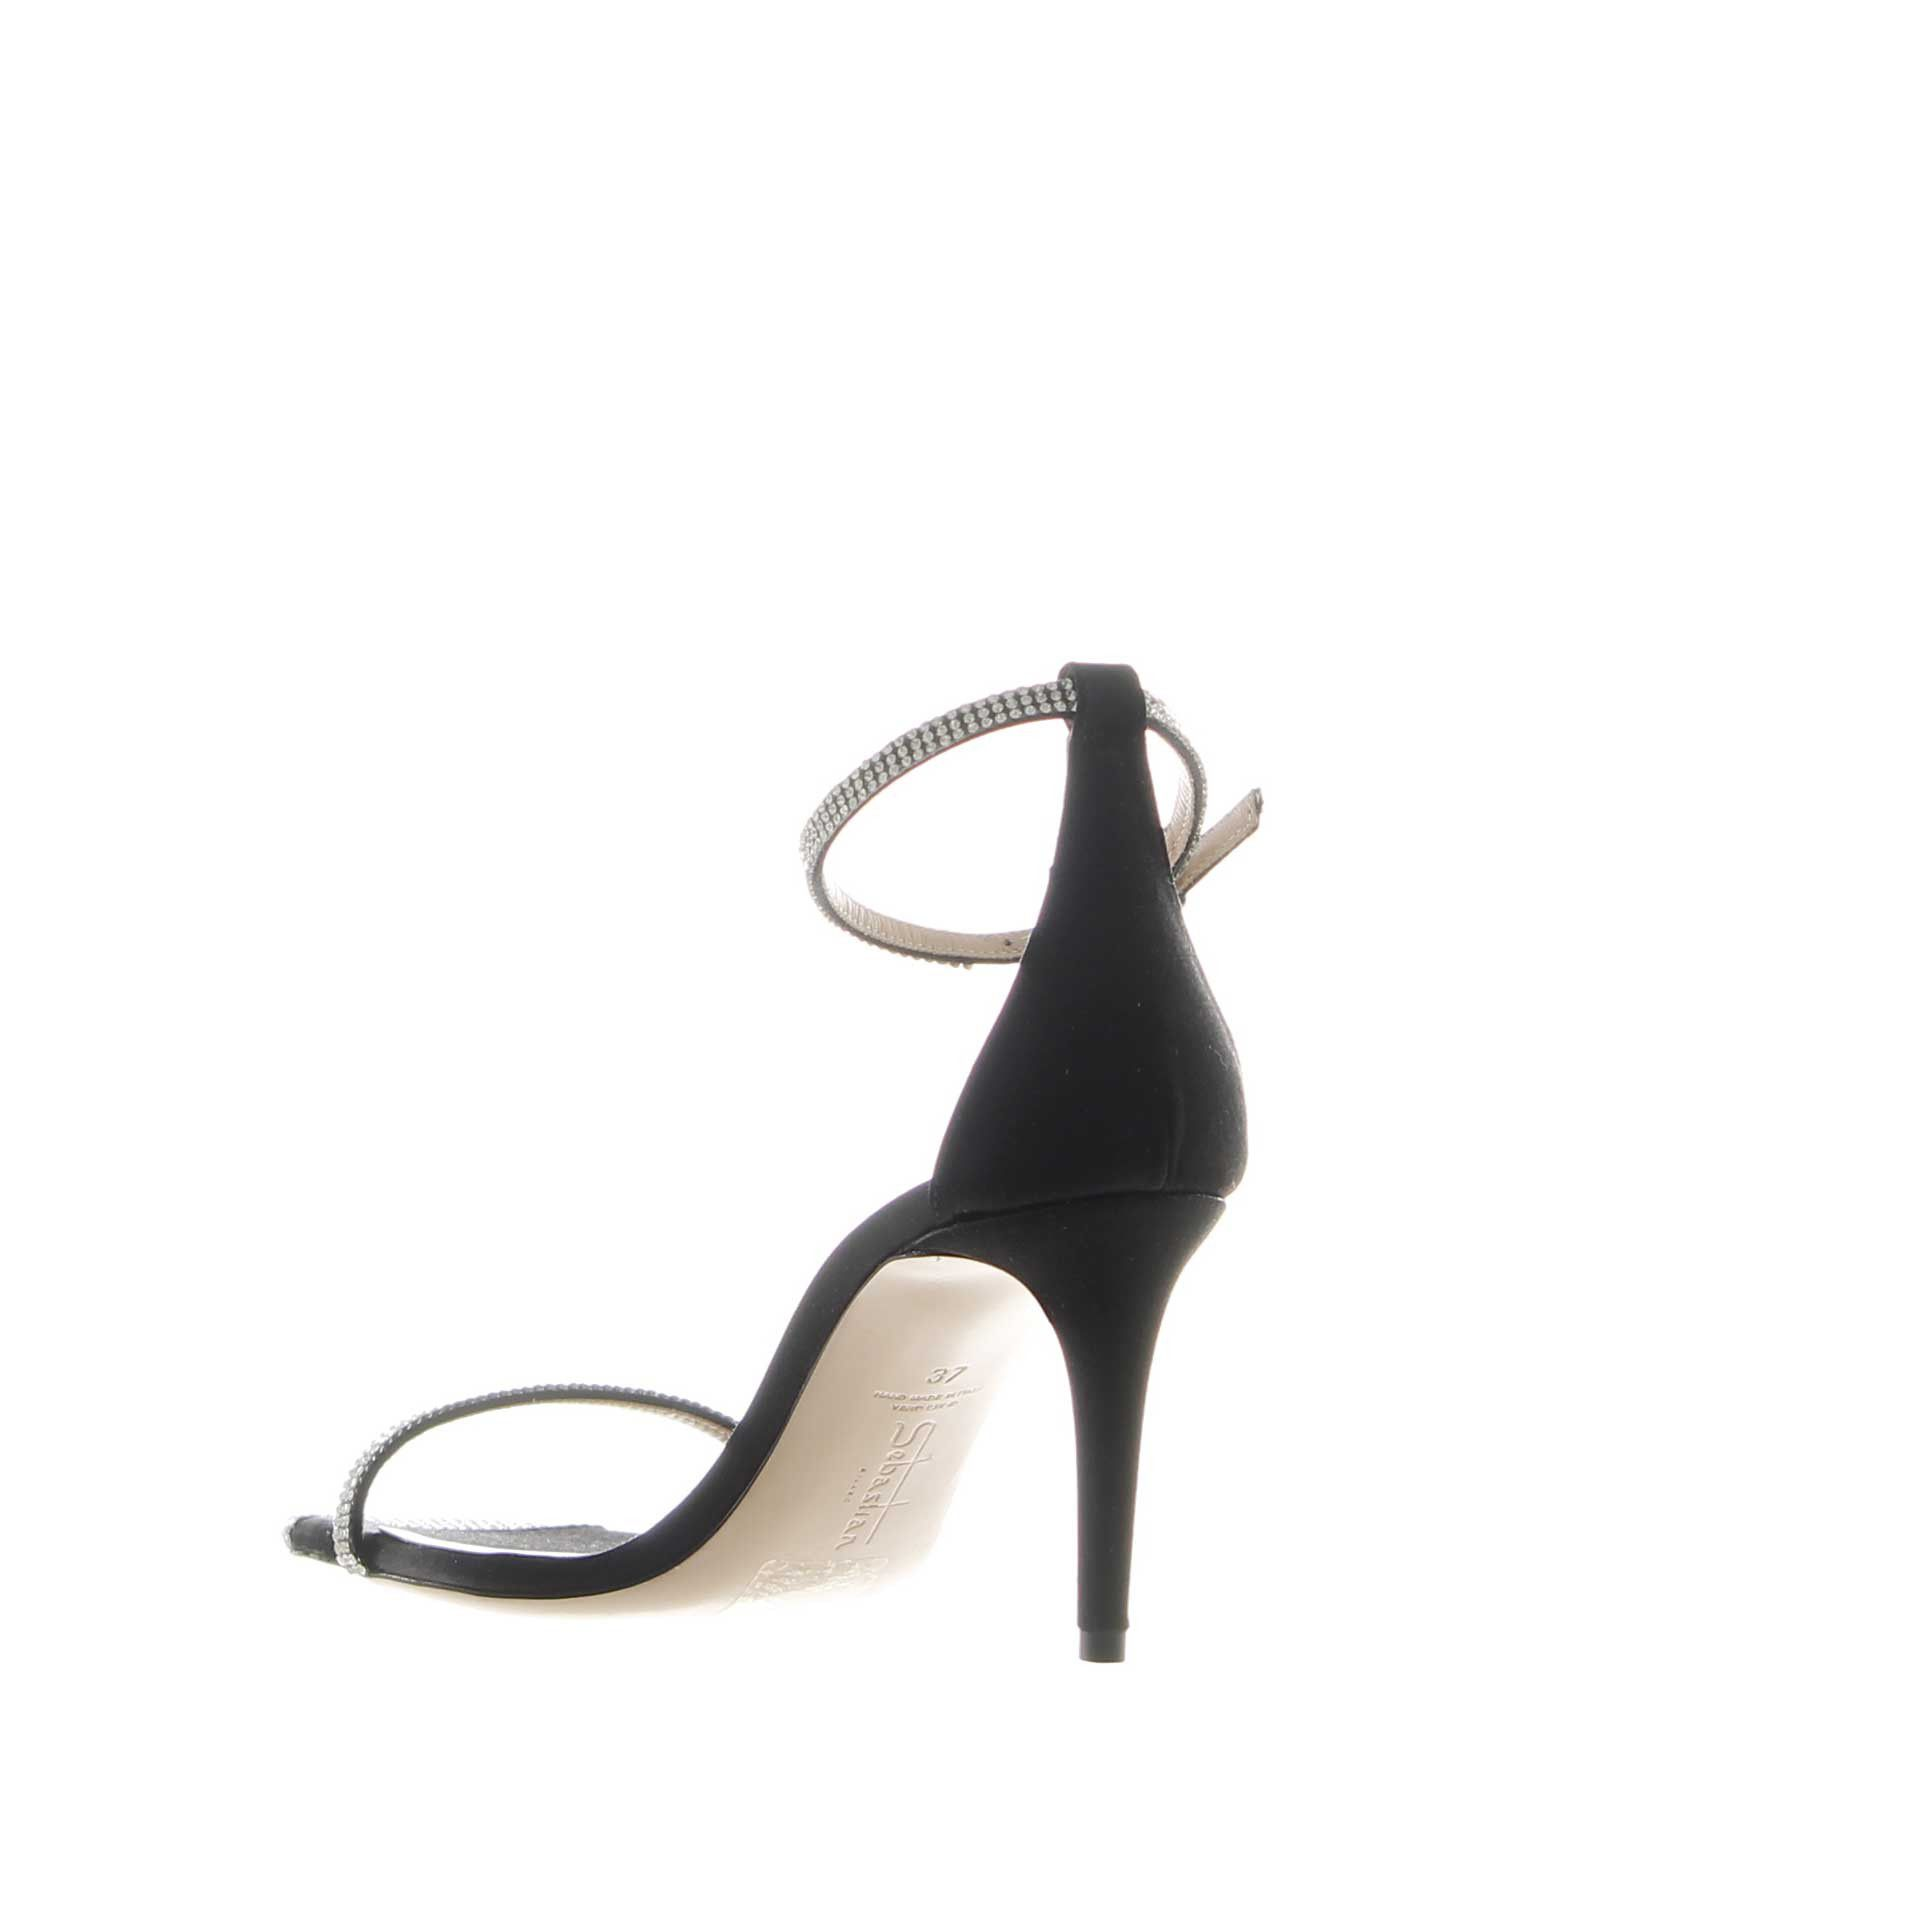 Sebastian sandalo in raso con strass da donna